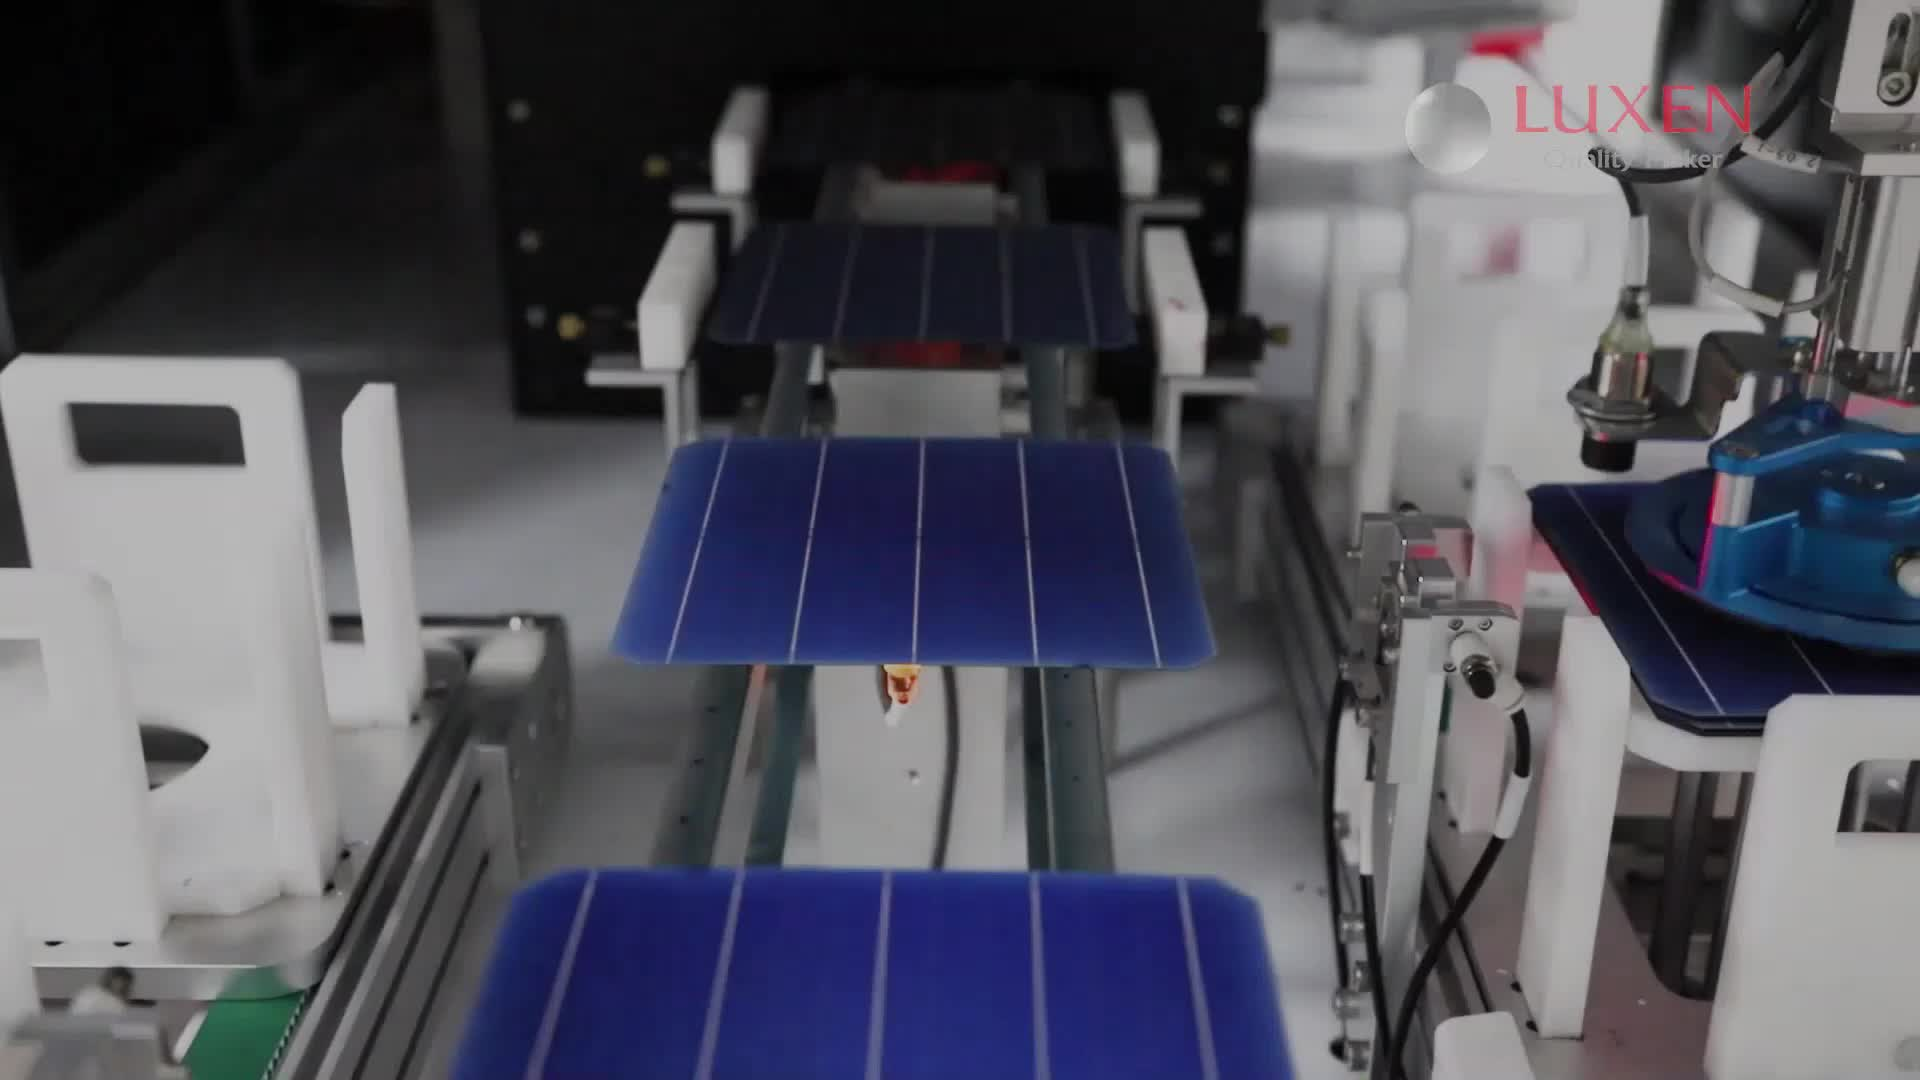 High Efficiency Module Price Silicon Cells Luxen PV Solar Panel 370W